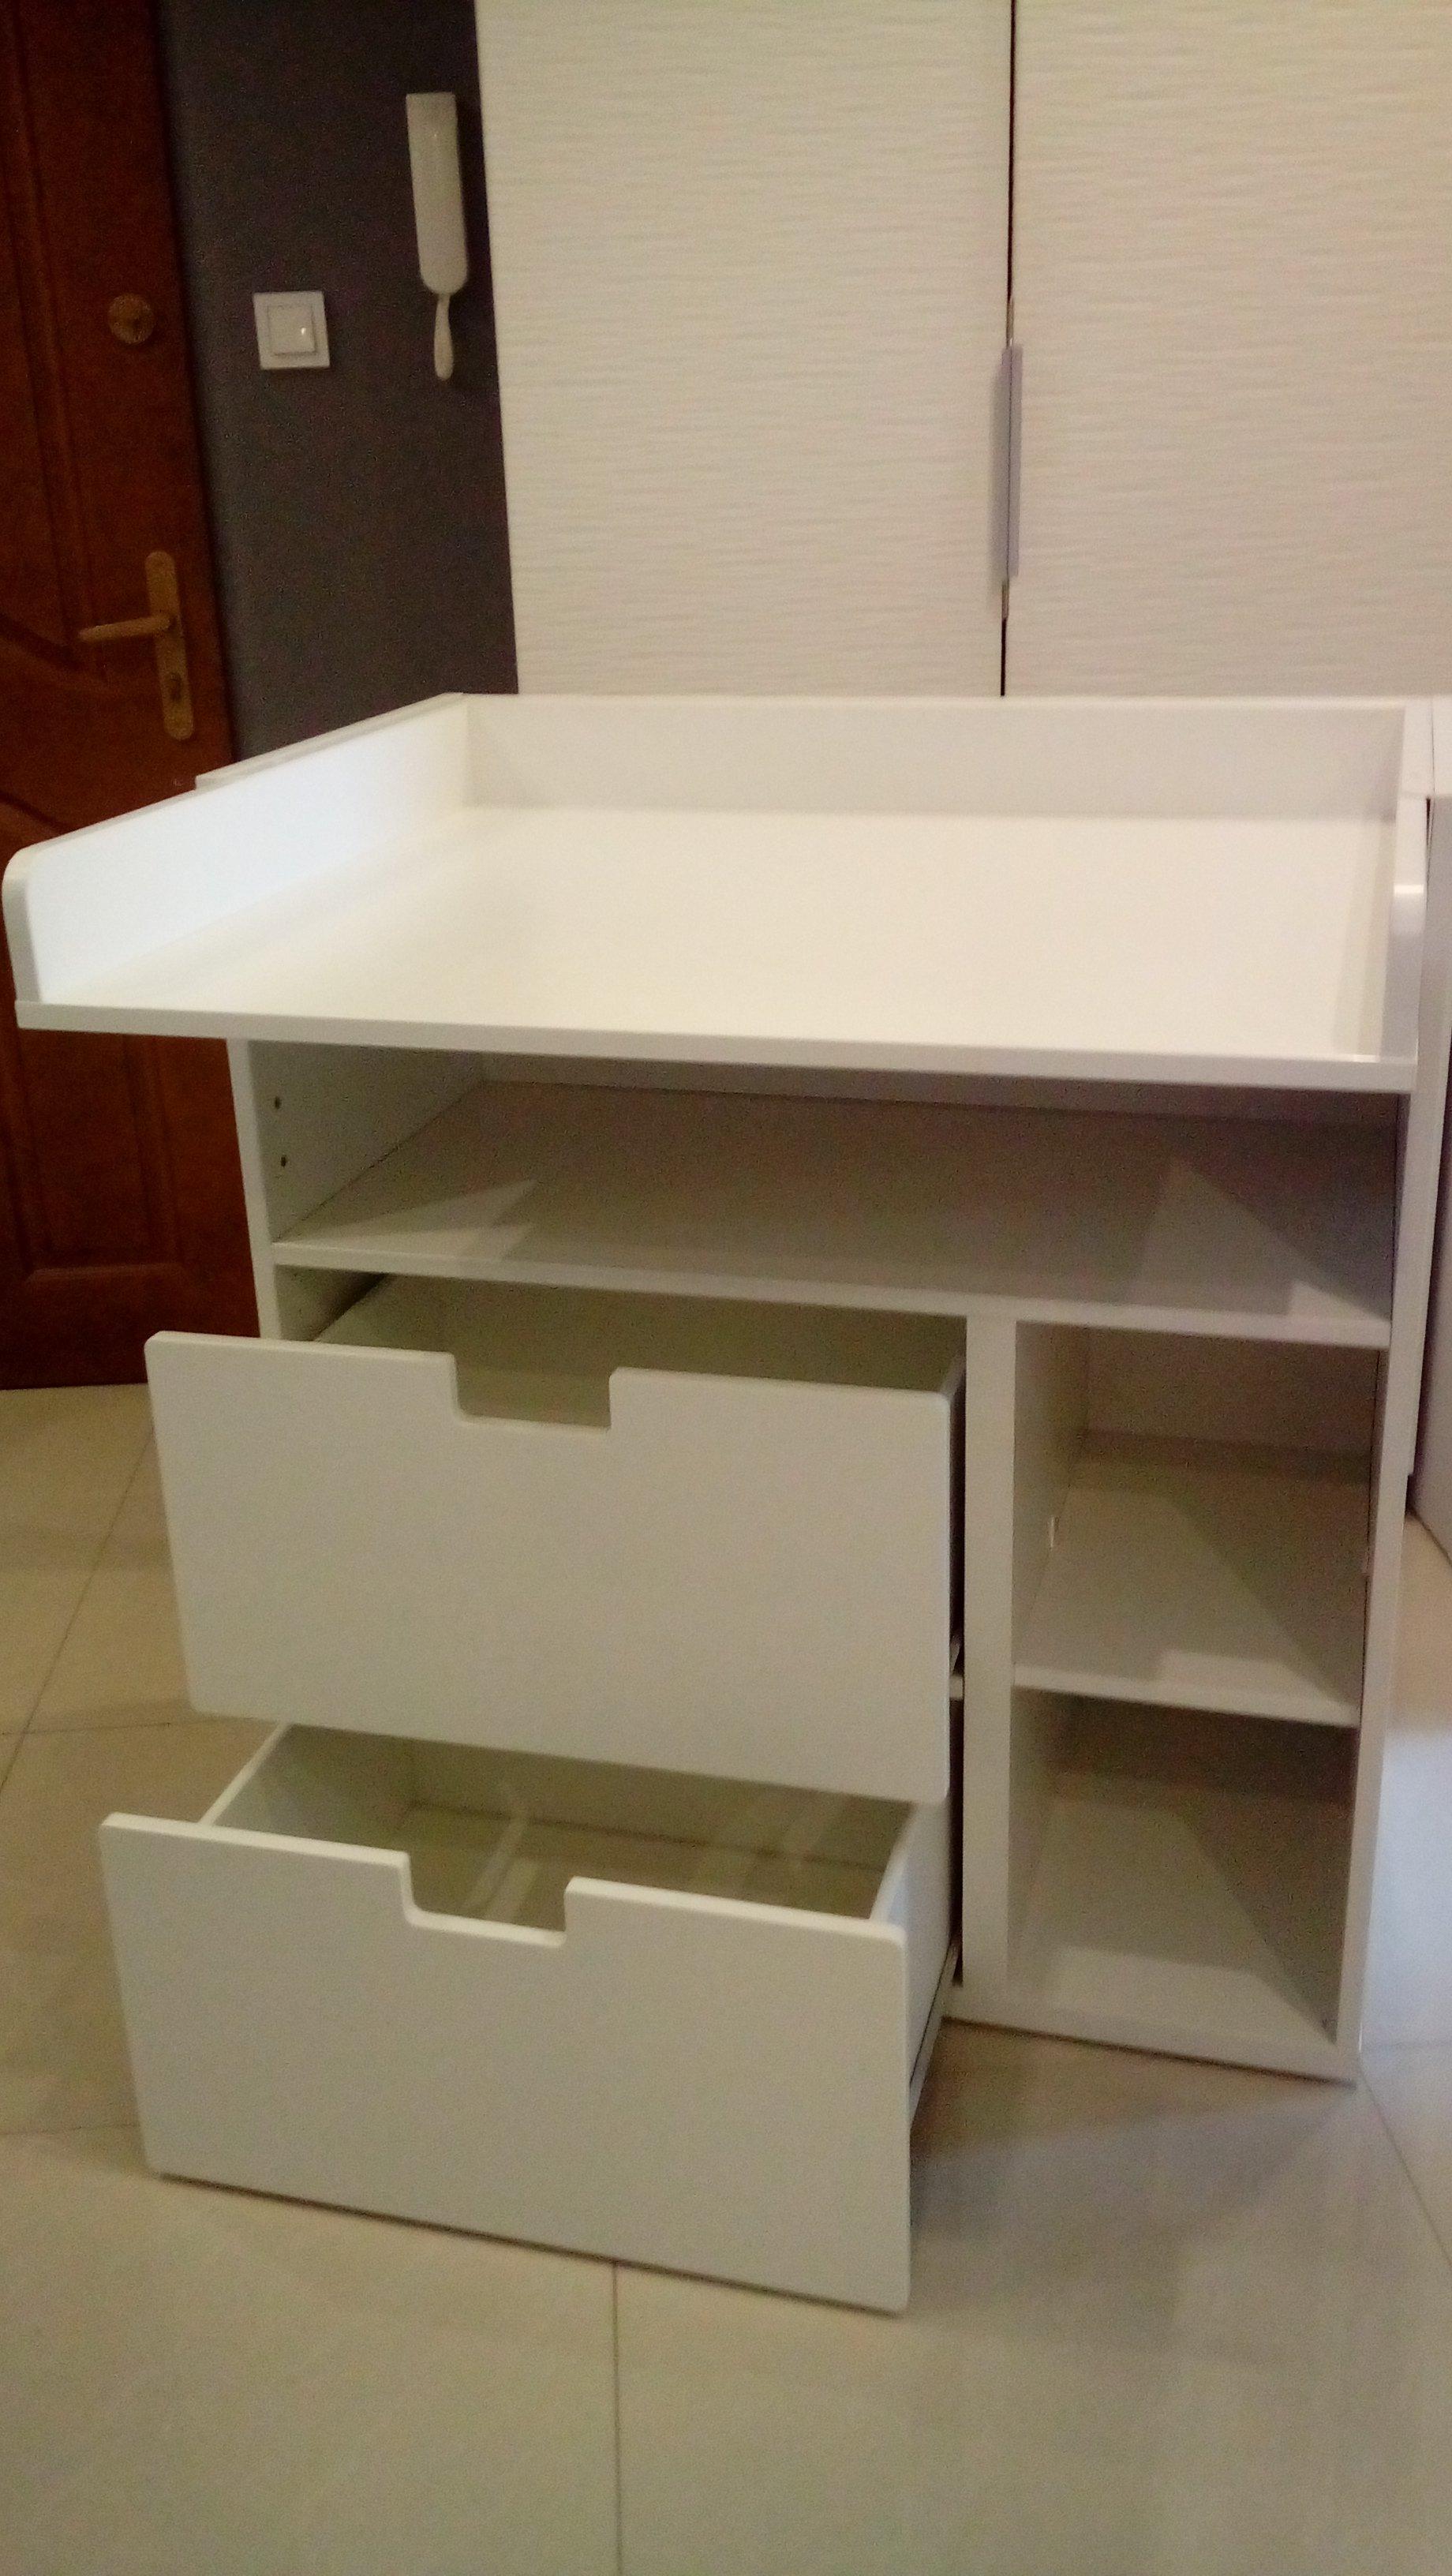 Sprzedam przewijak/biurko IKEA STUVA